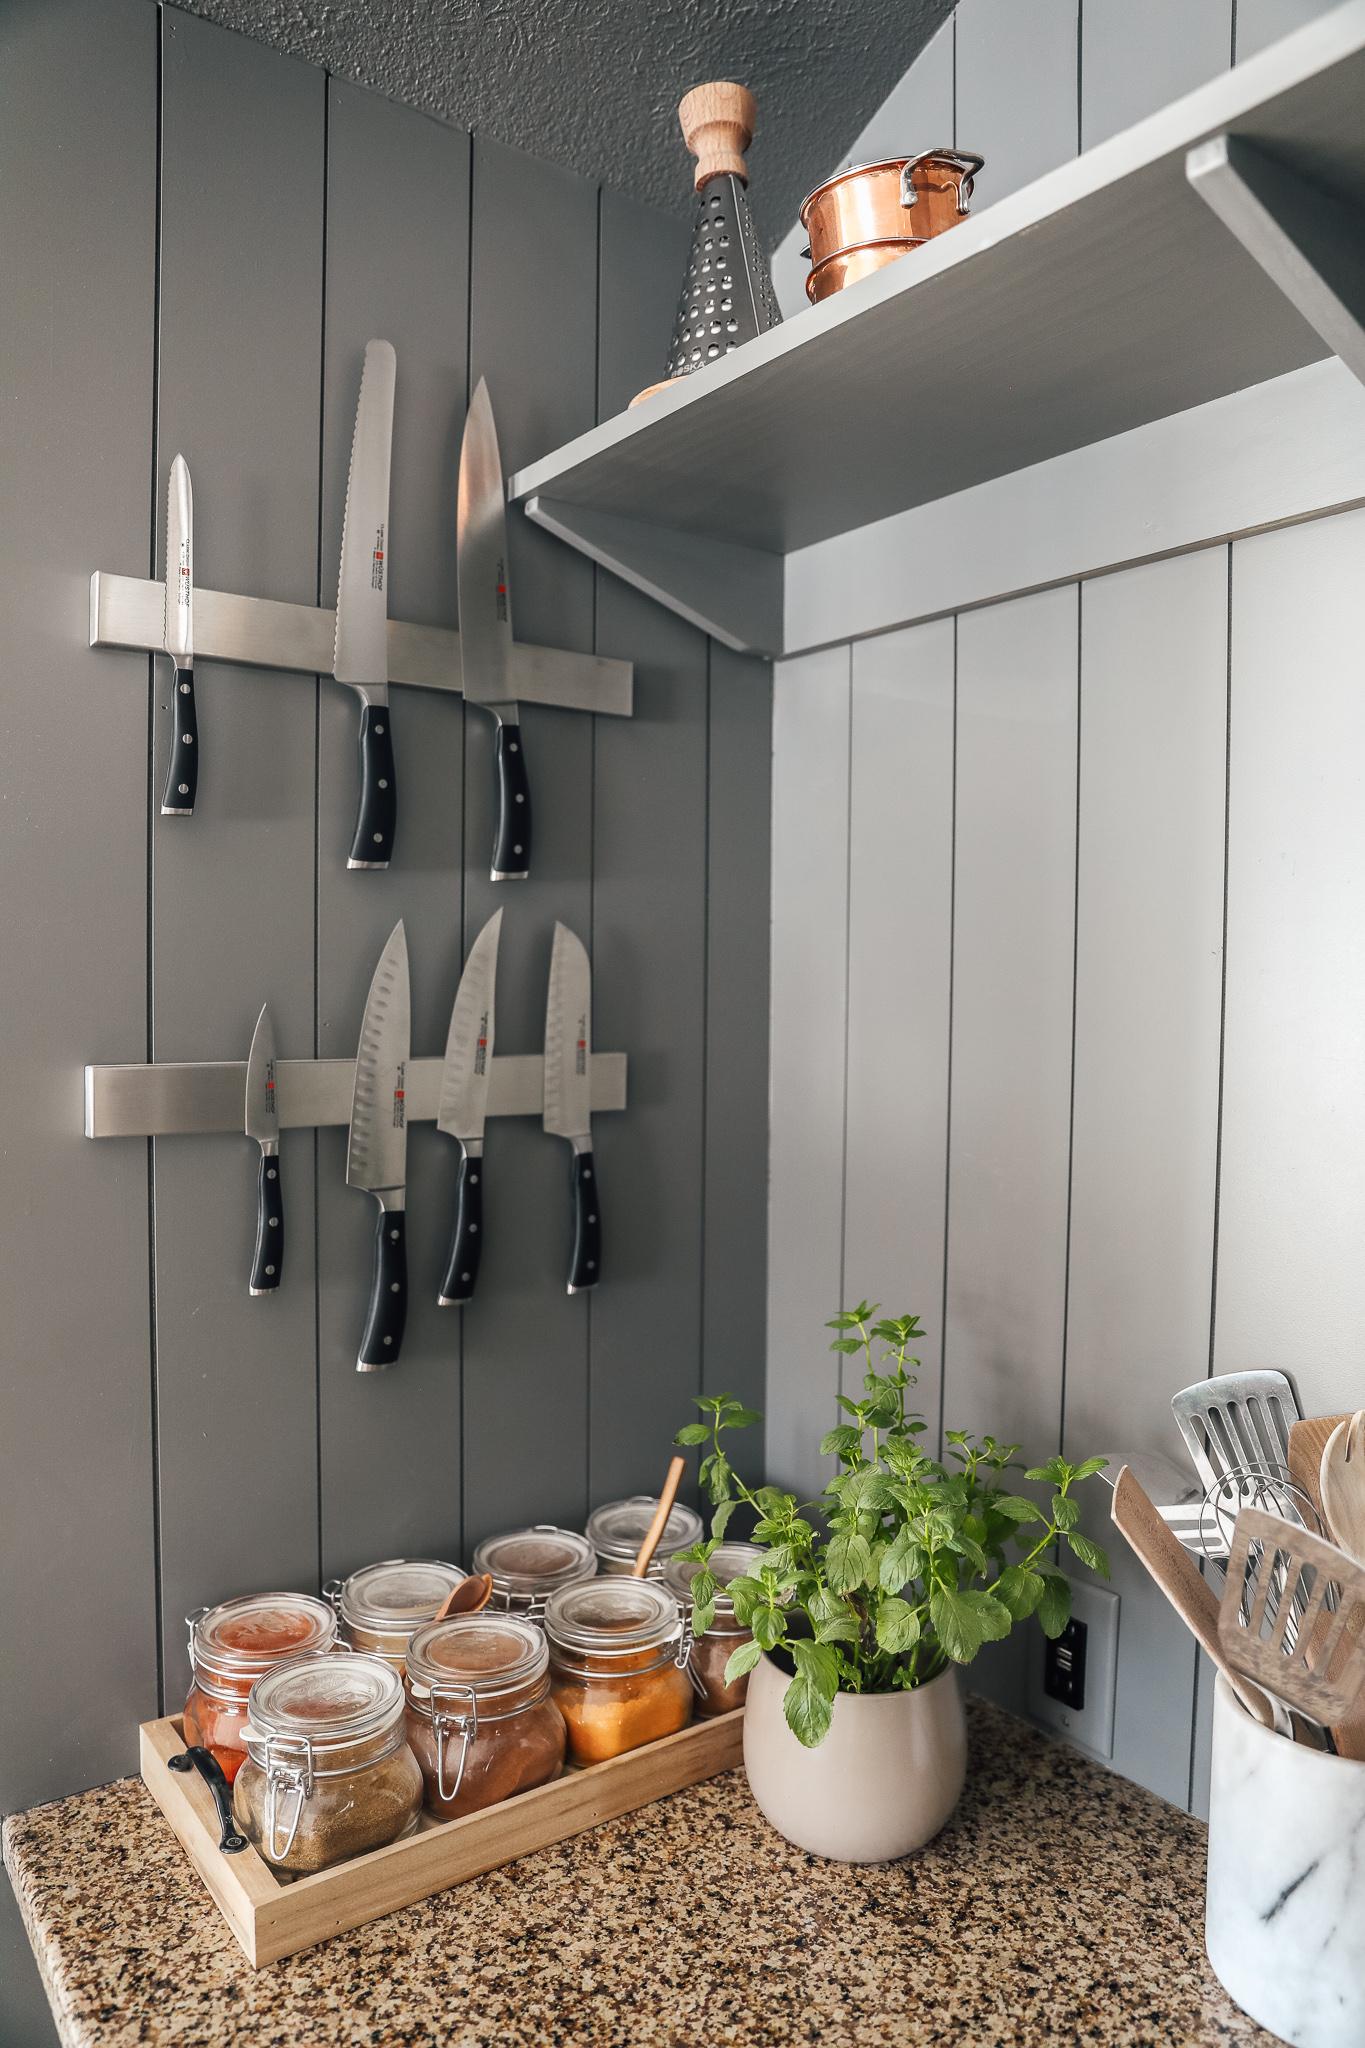 Chris Loves Julia Kitchen: Knife Storage